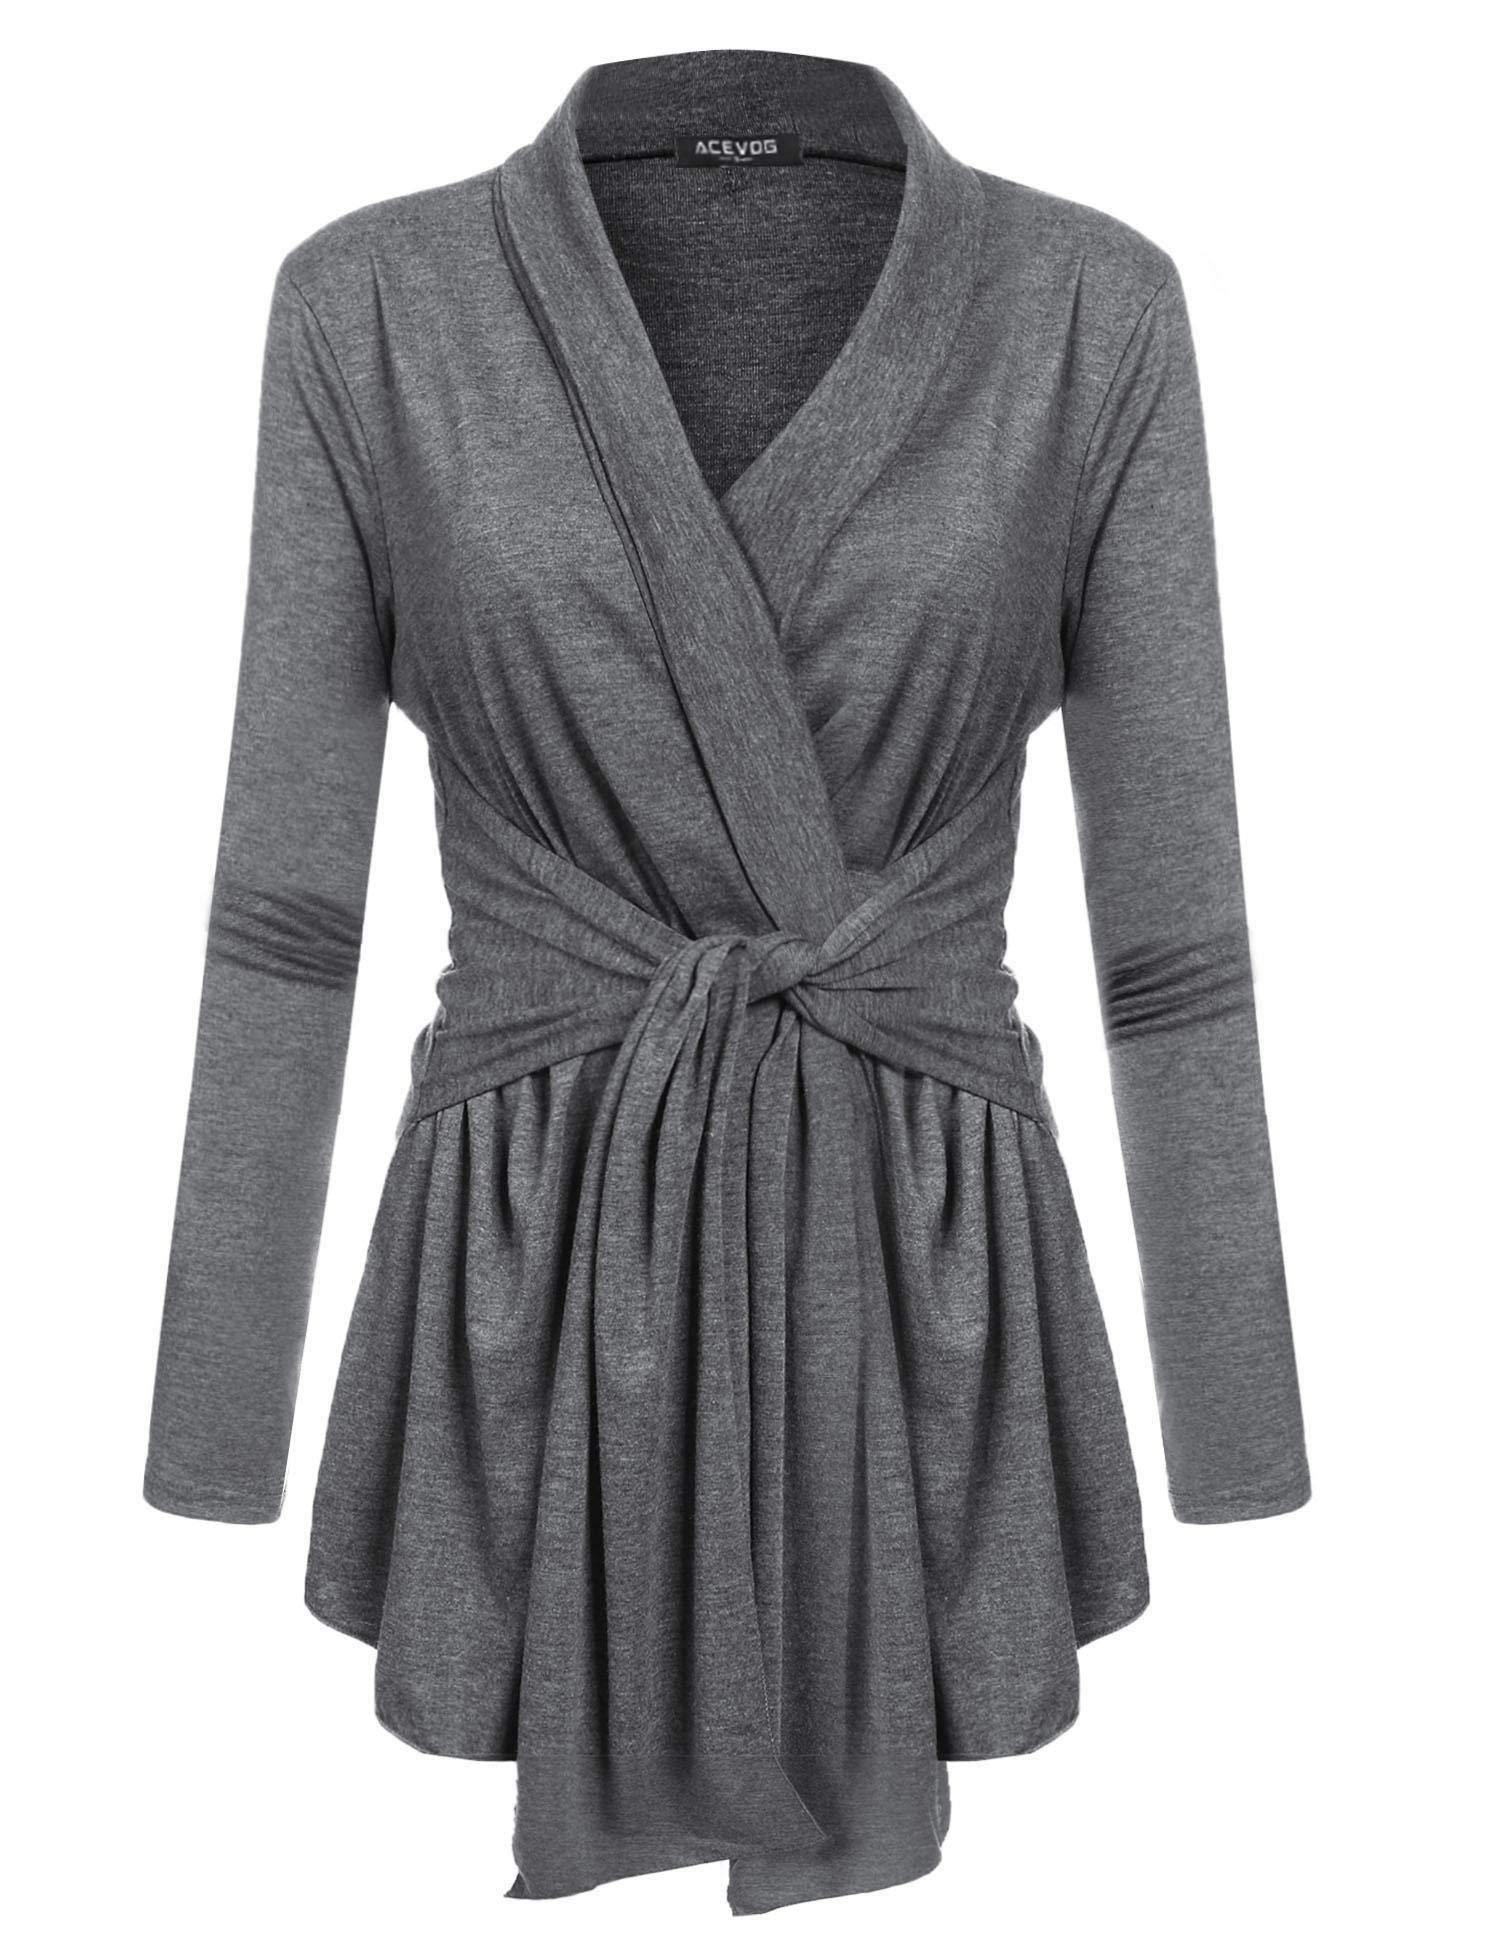 ACEVOG Womens Open Front Drape Hem Lightweight Long Sleeve Knit Cardigan (S-3XL) Dark Grey M